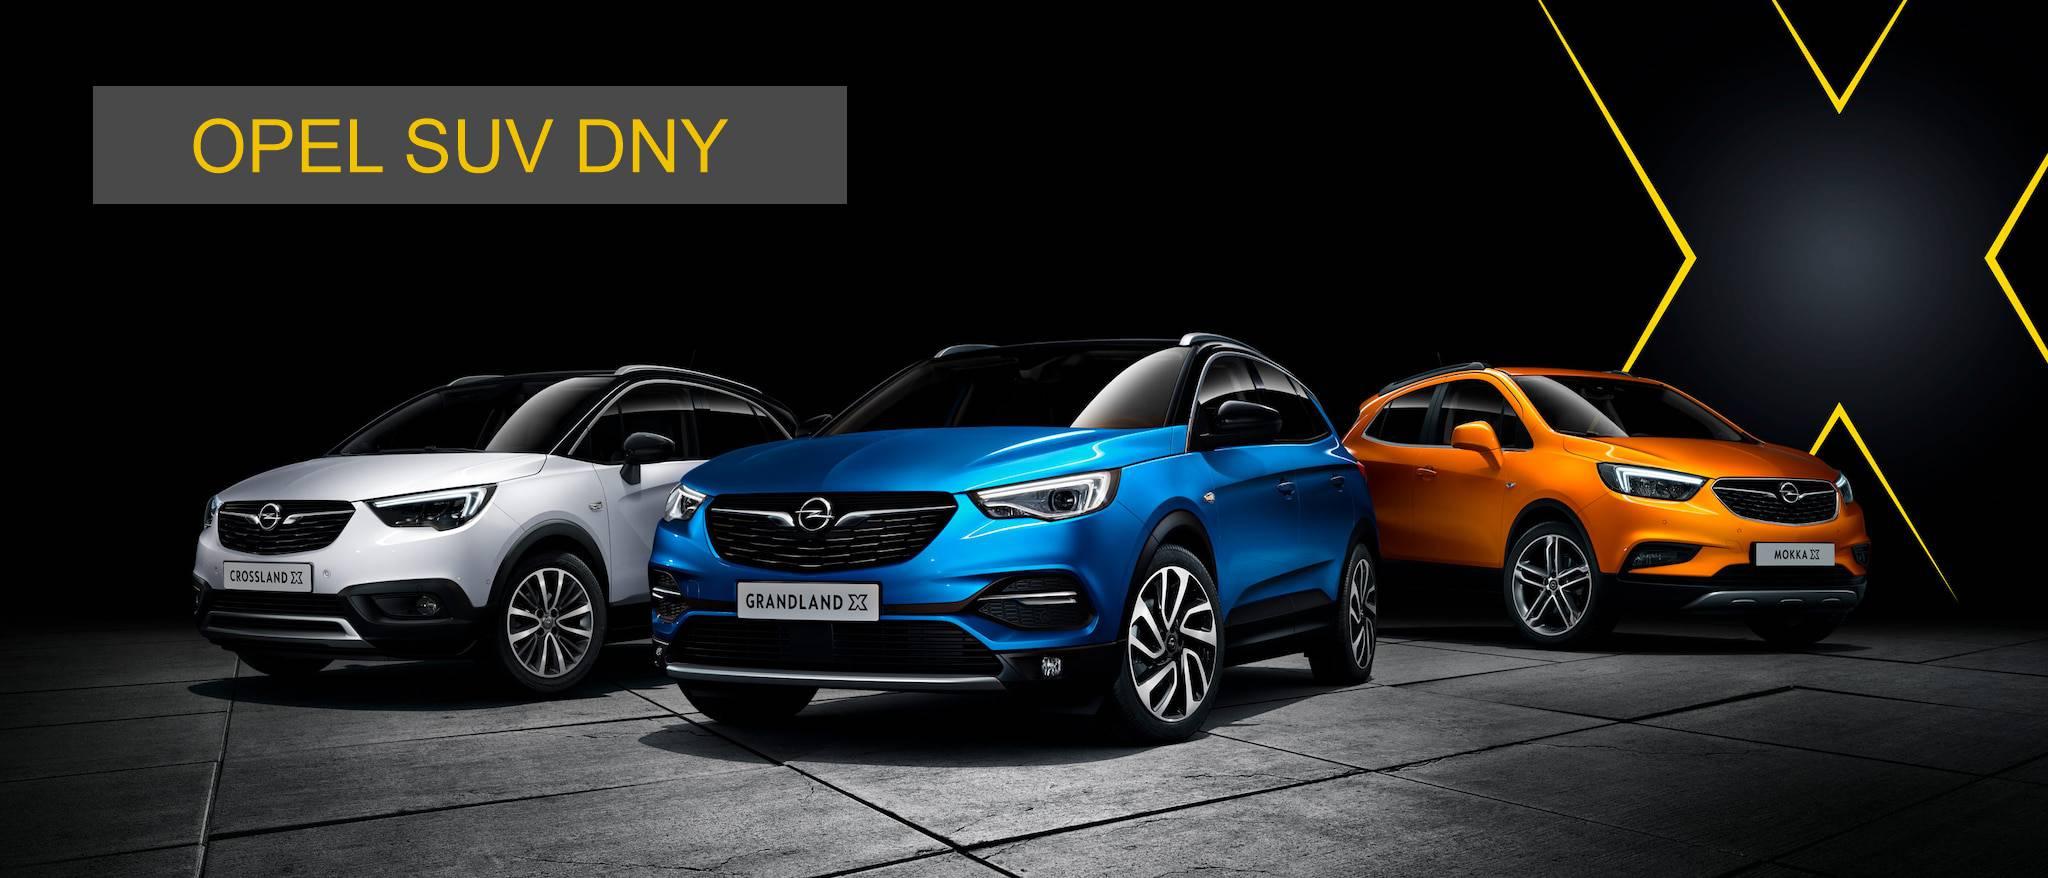 Opel SUV dny